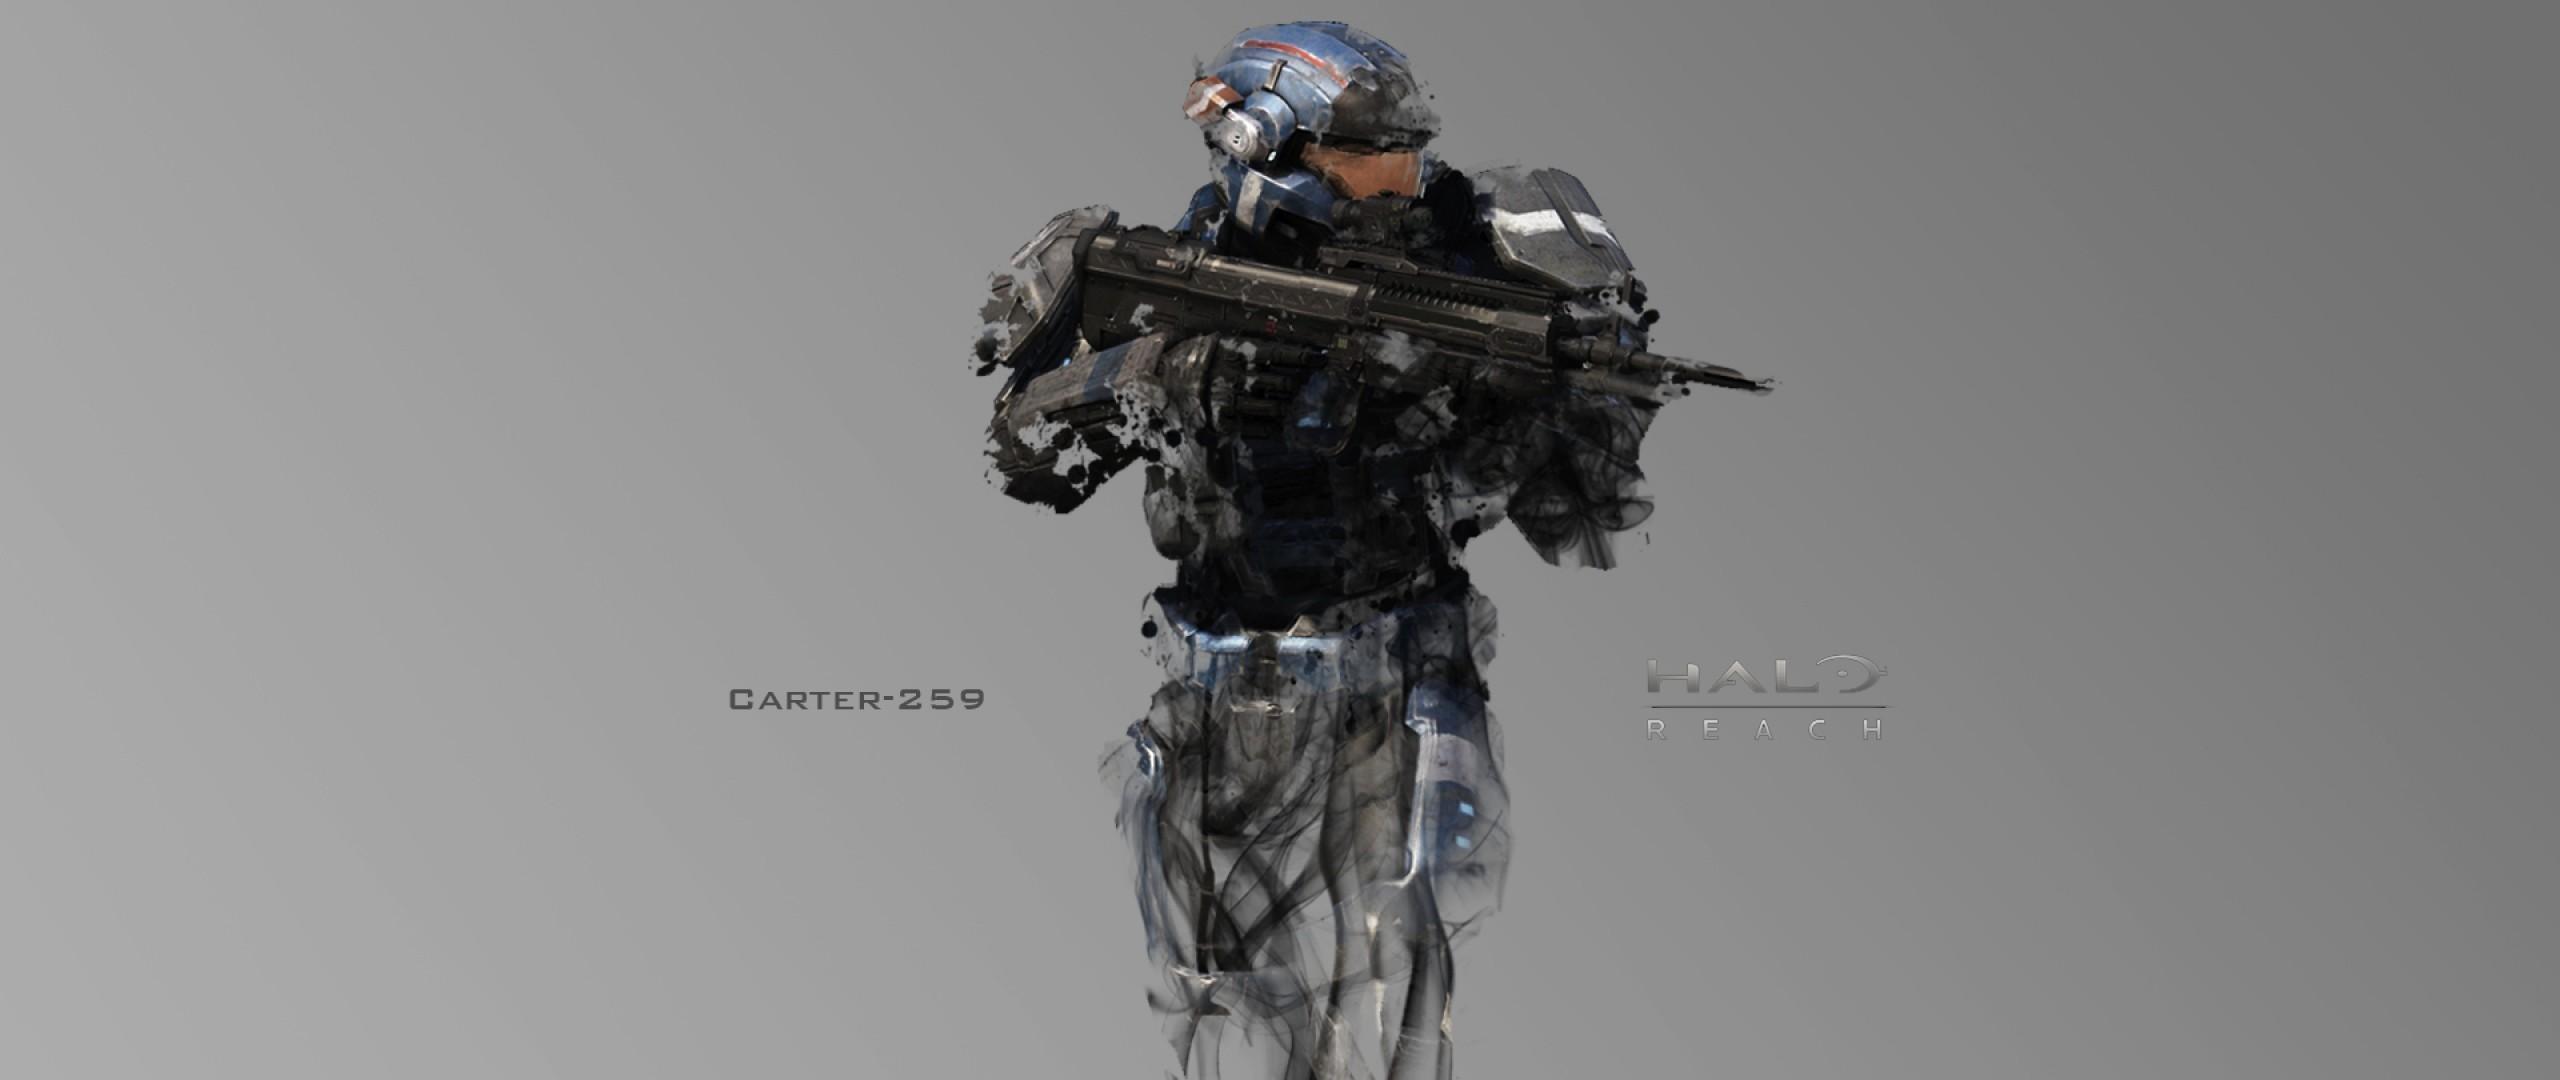 Preview wallpaper halo, soldier, gun, carter-259 2560×1080